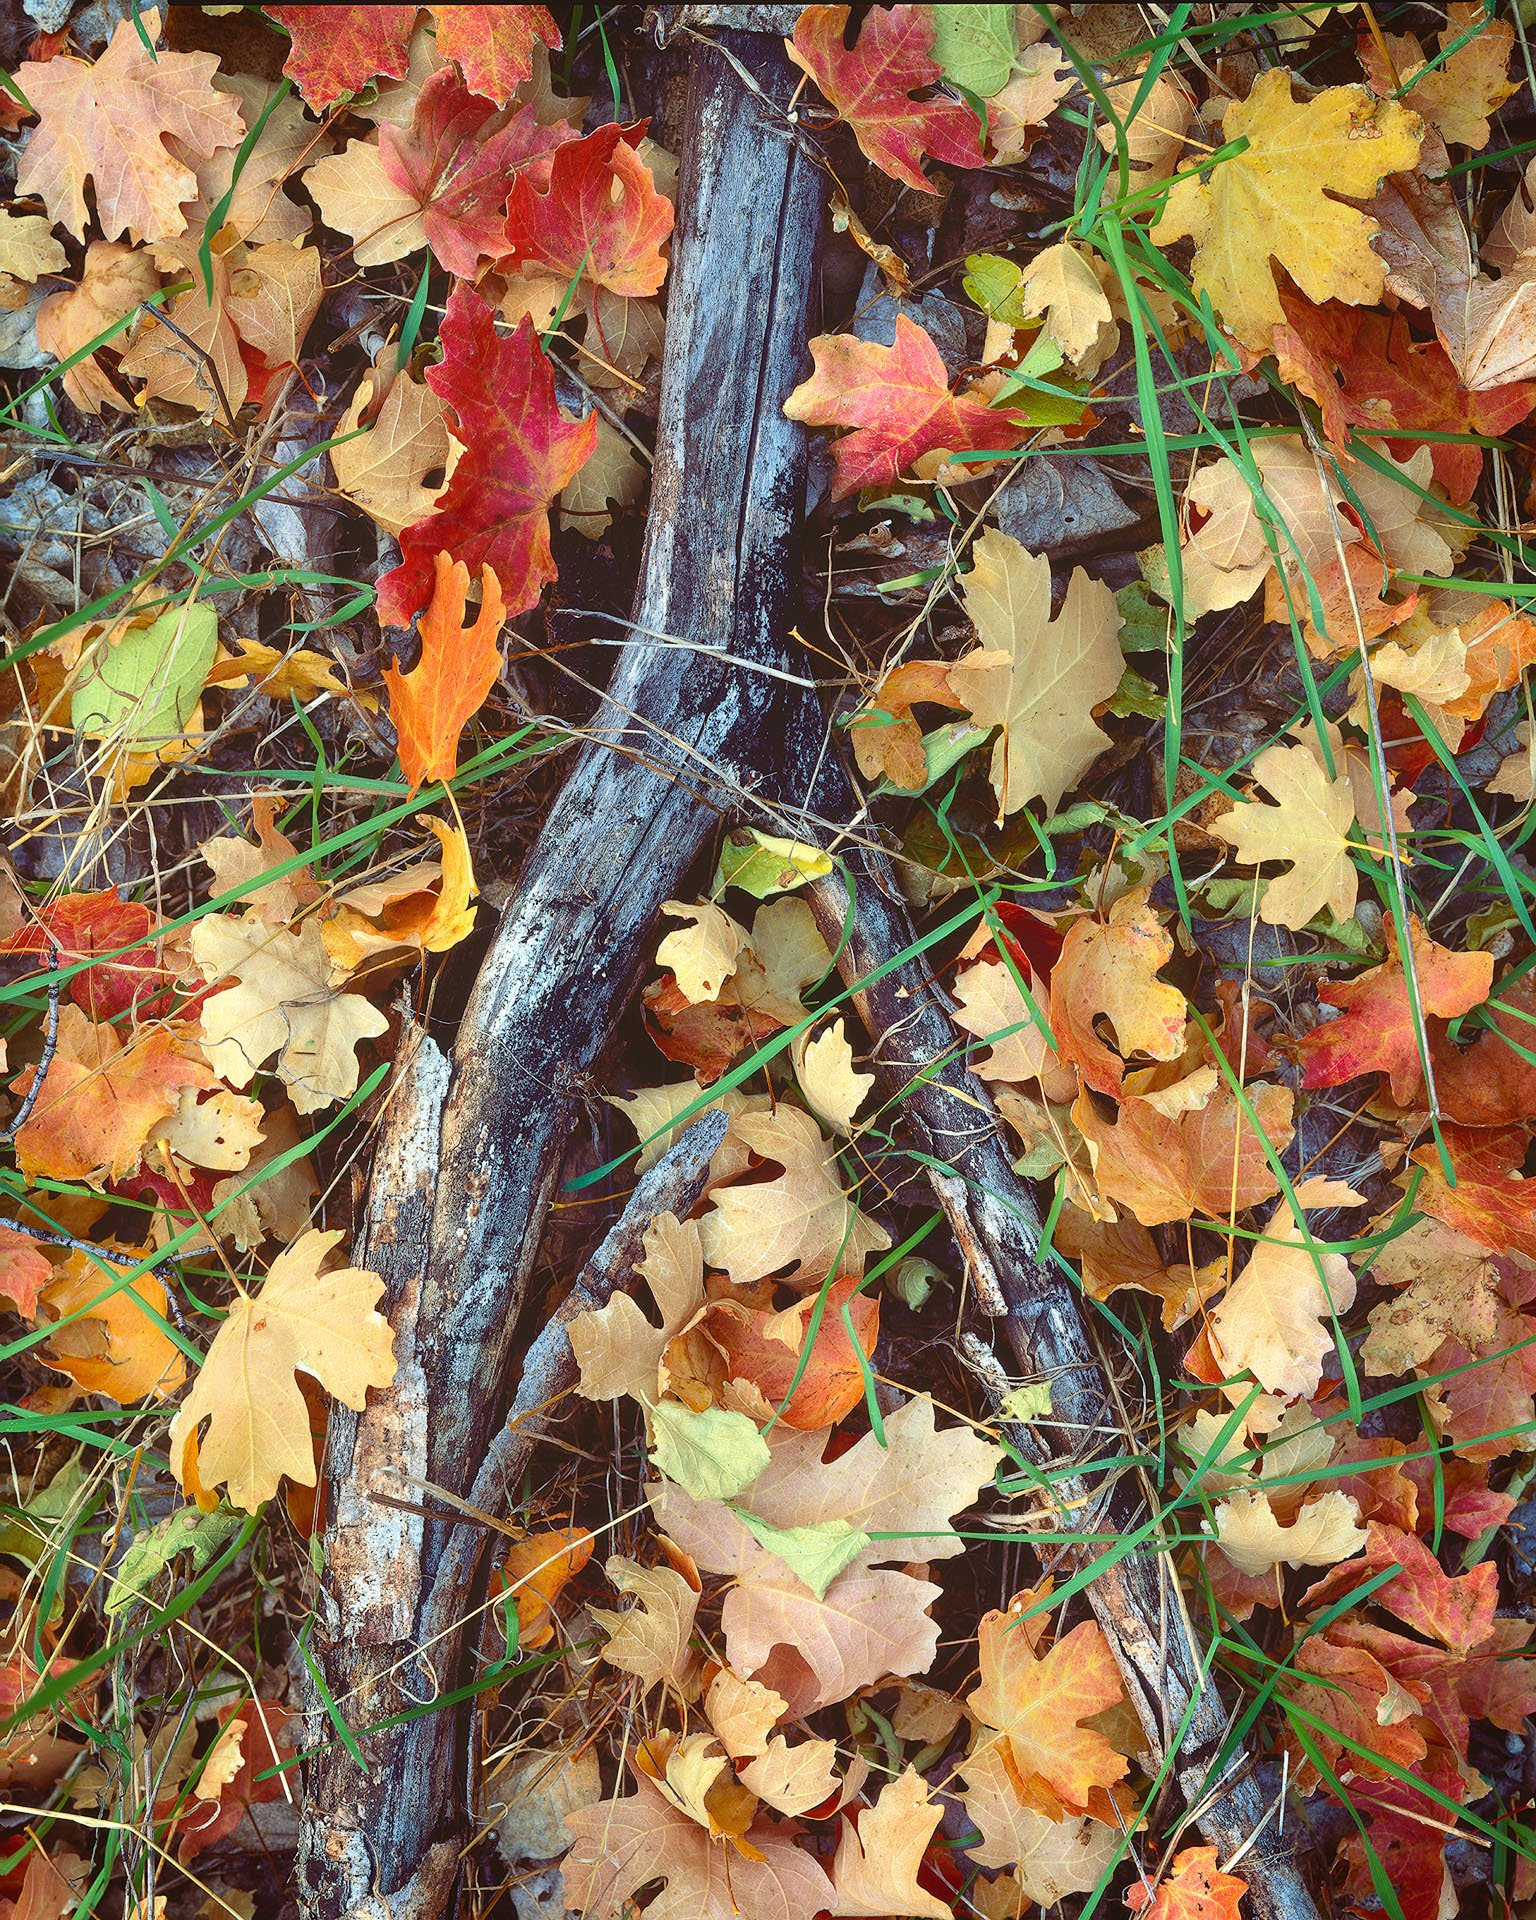 Large Format Film Landscape Photography Journey in Zion National Park